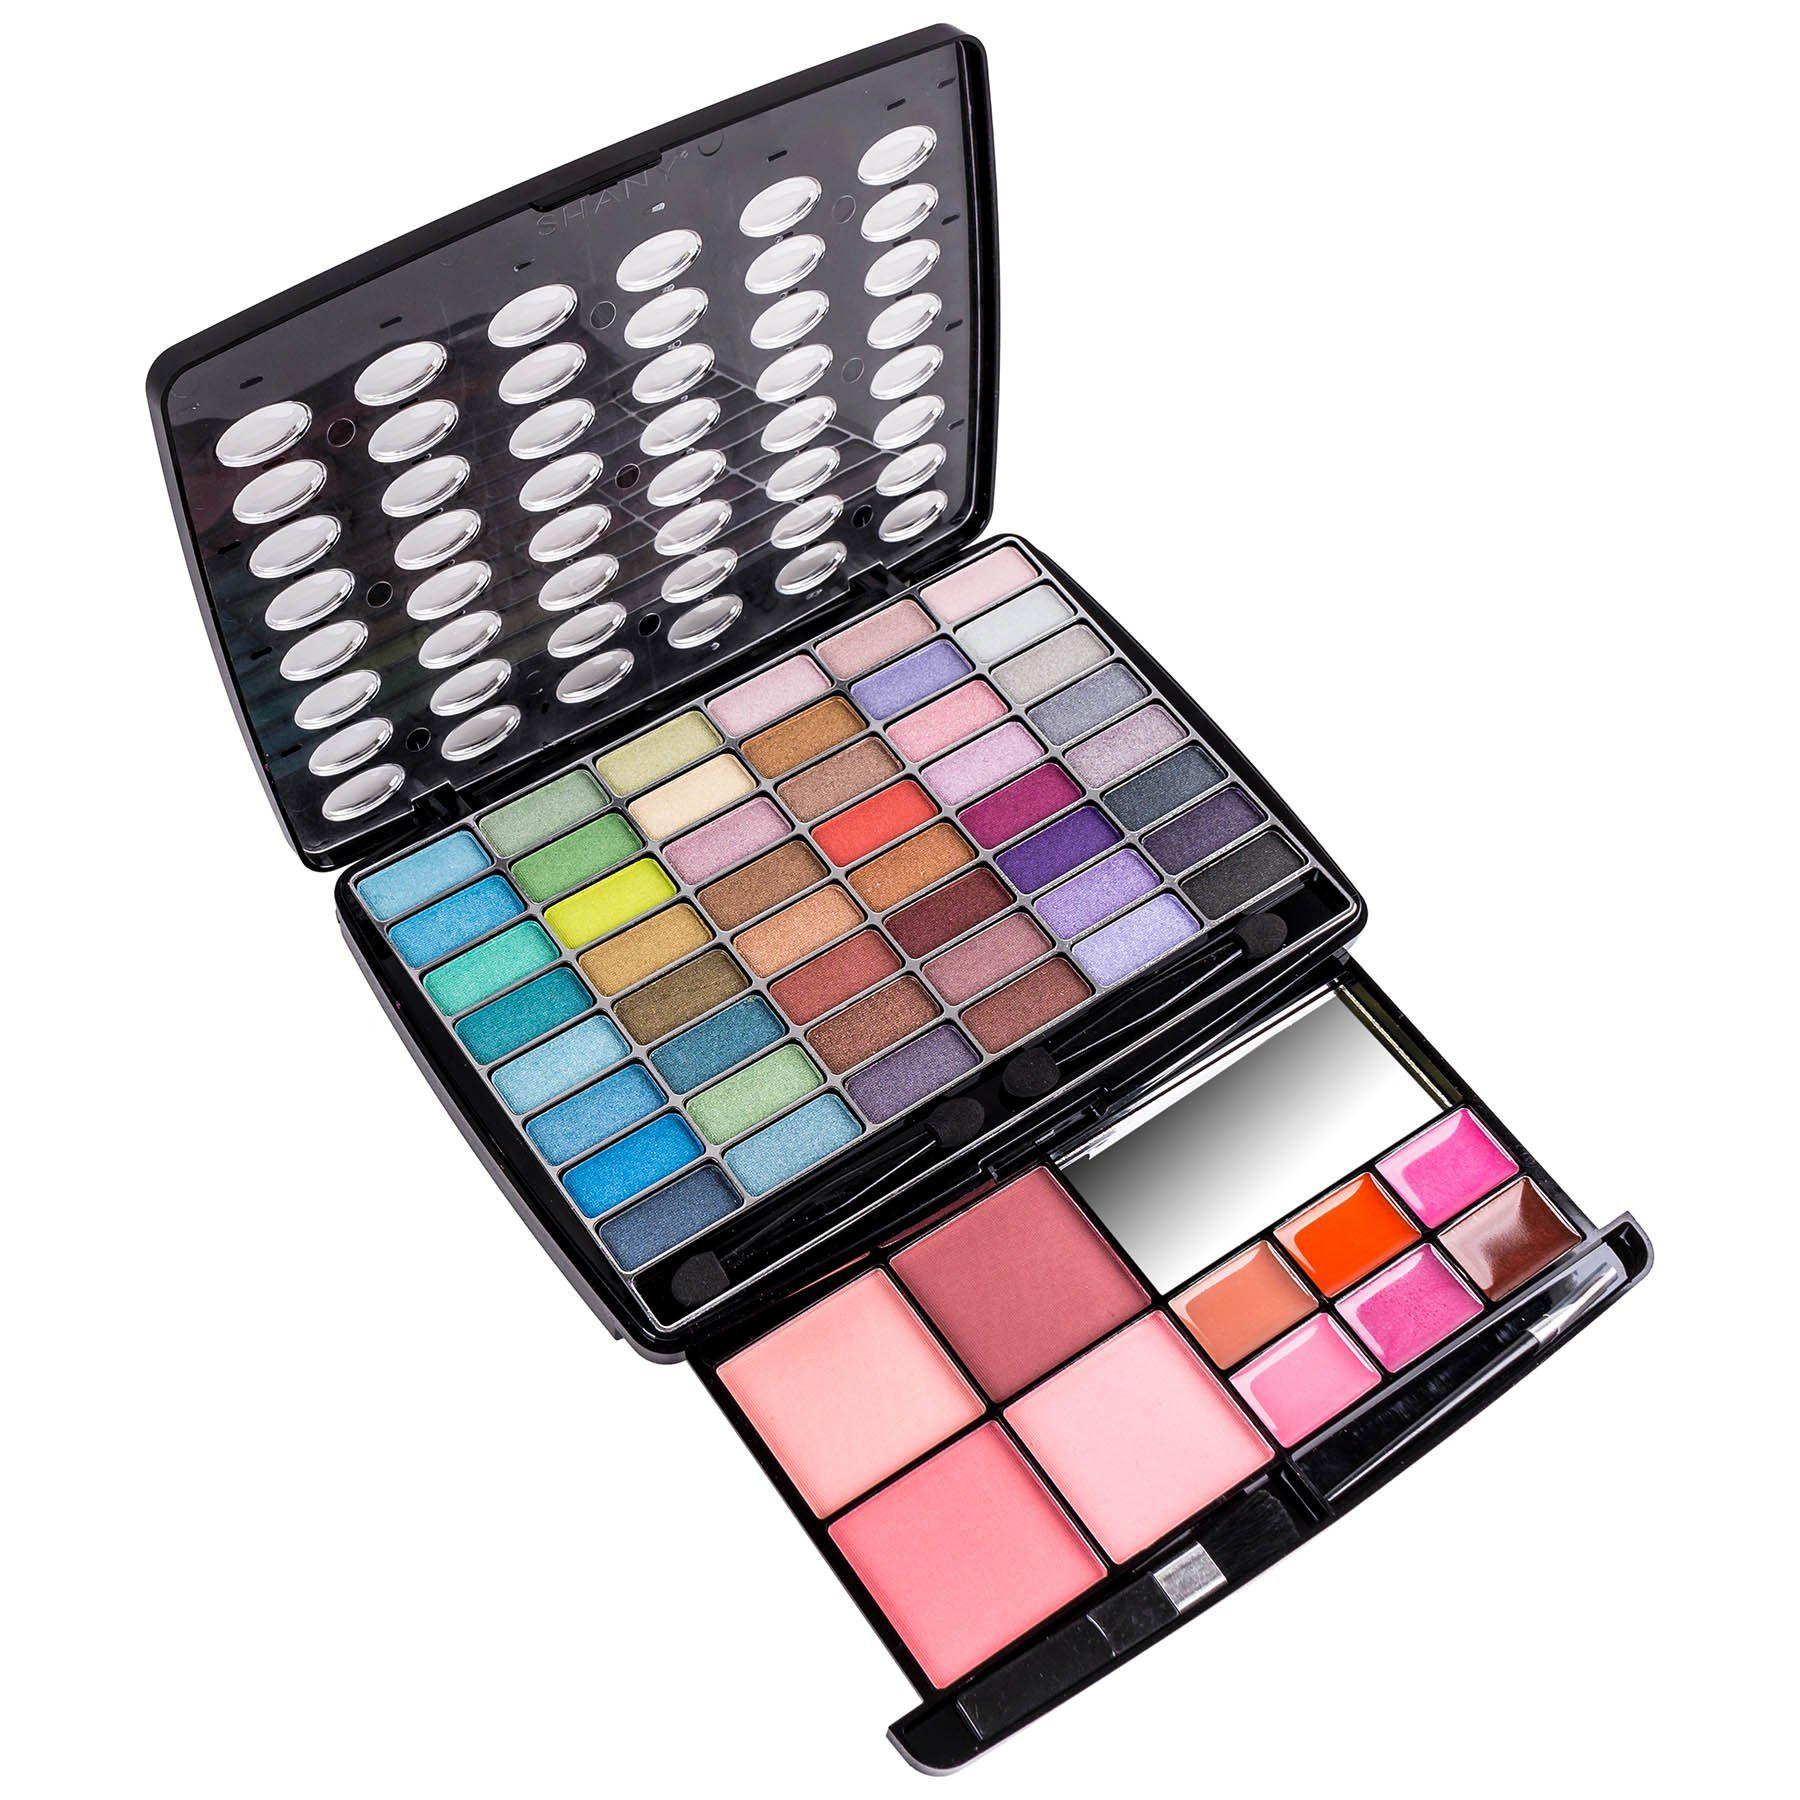 Shany Glamour Girl Makeup Kit 48 Eyeshadow 4 Blush 6 Lip Glosses